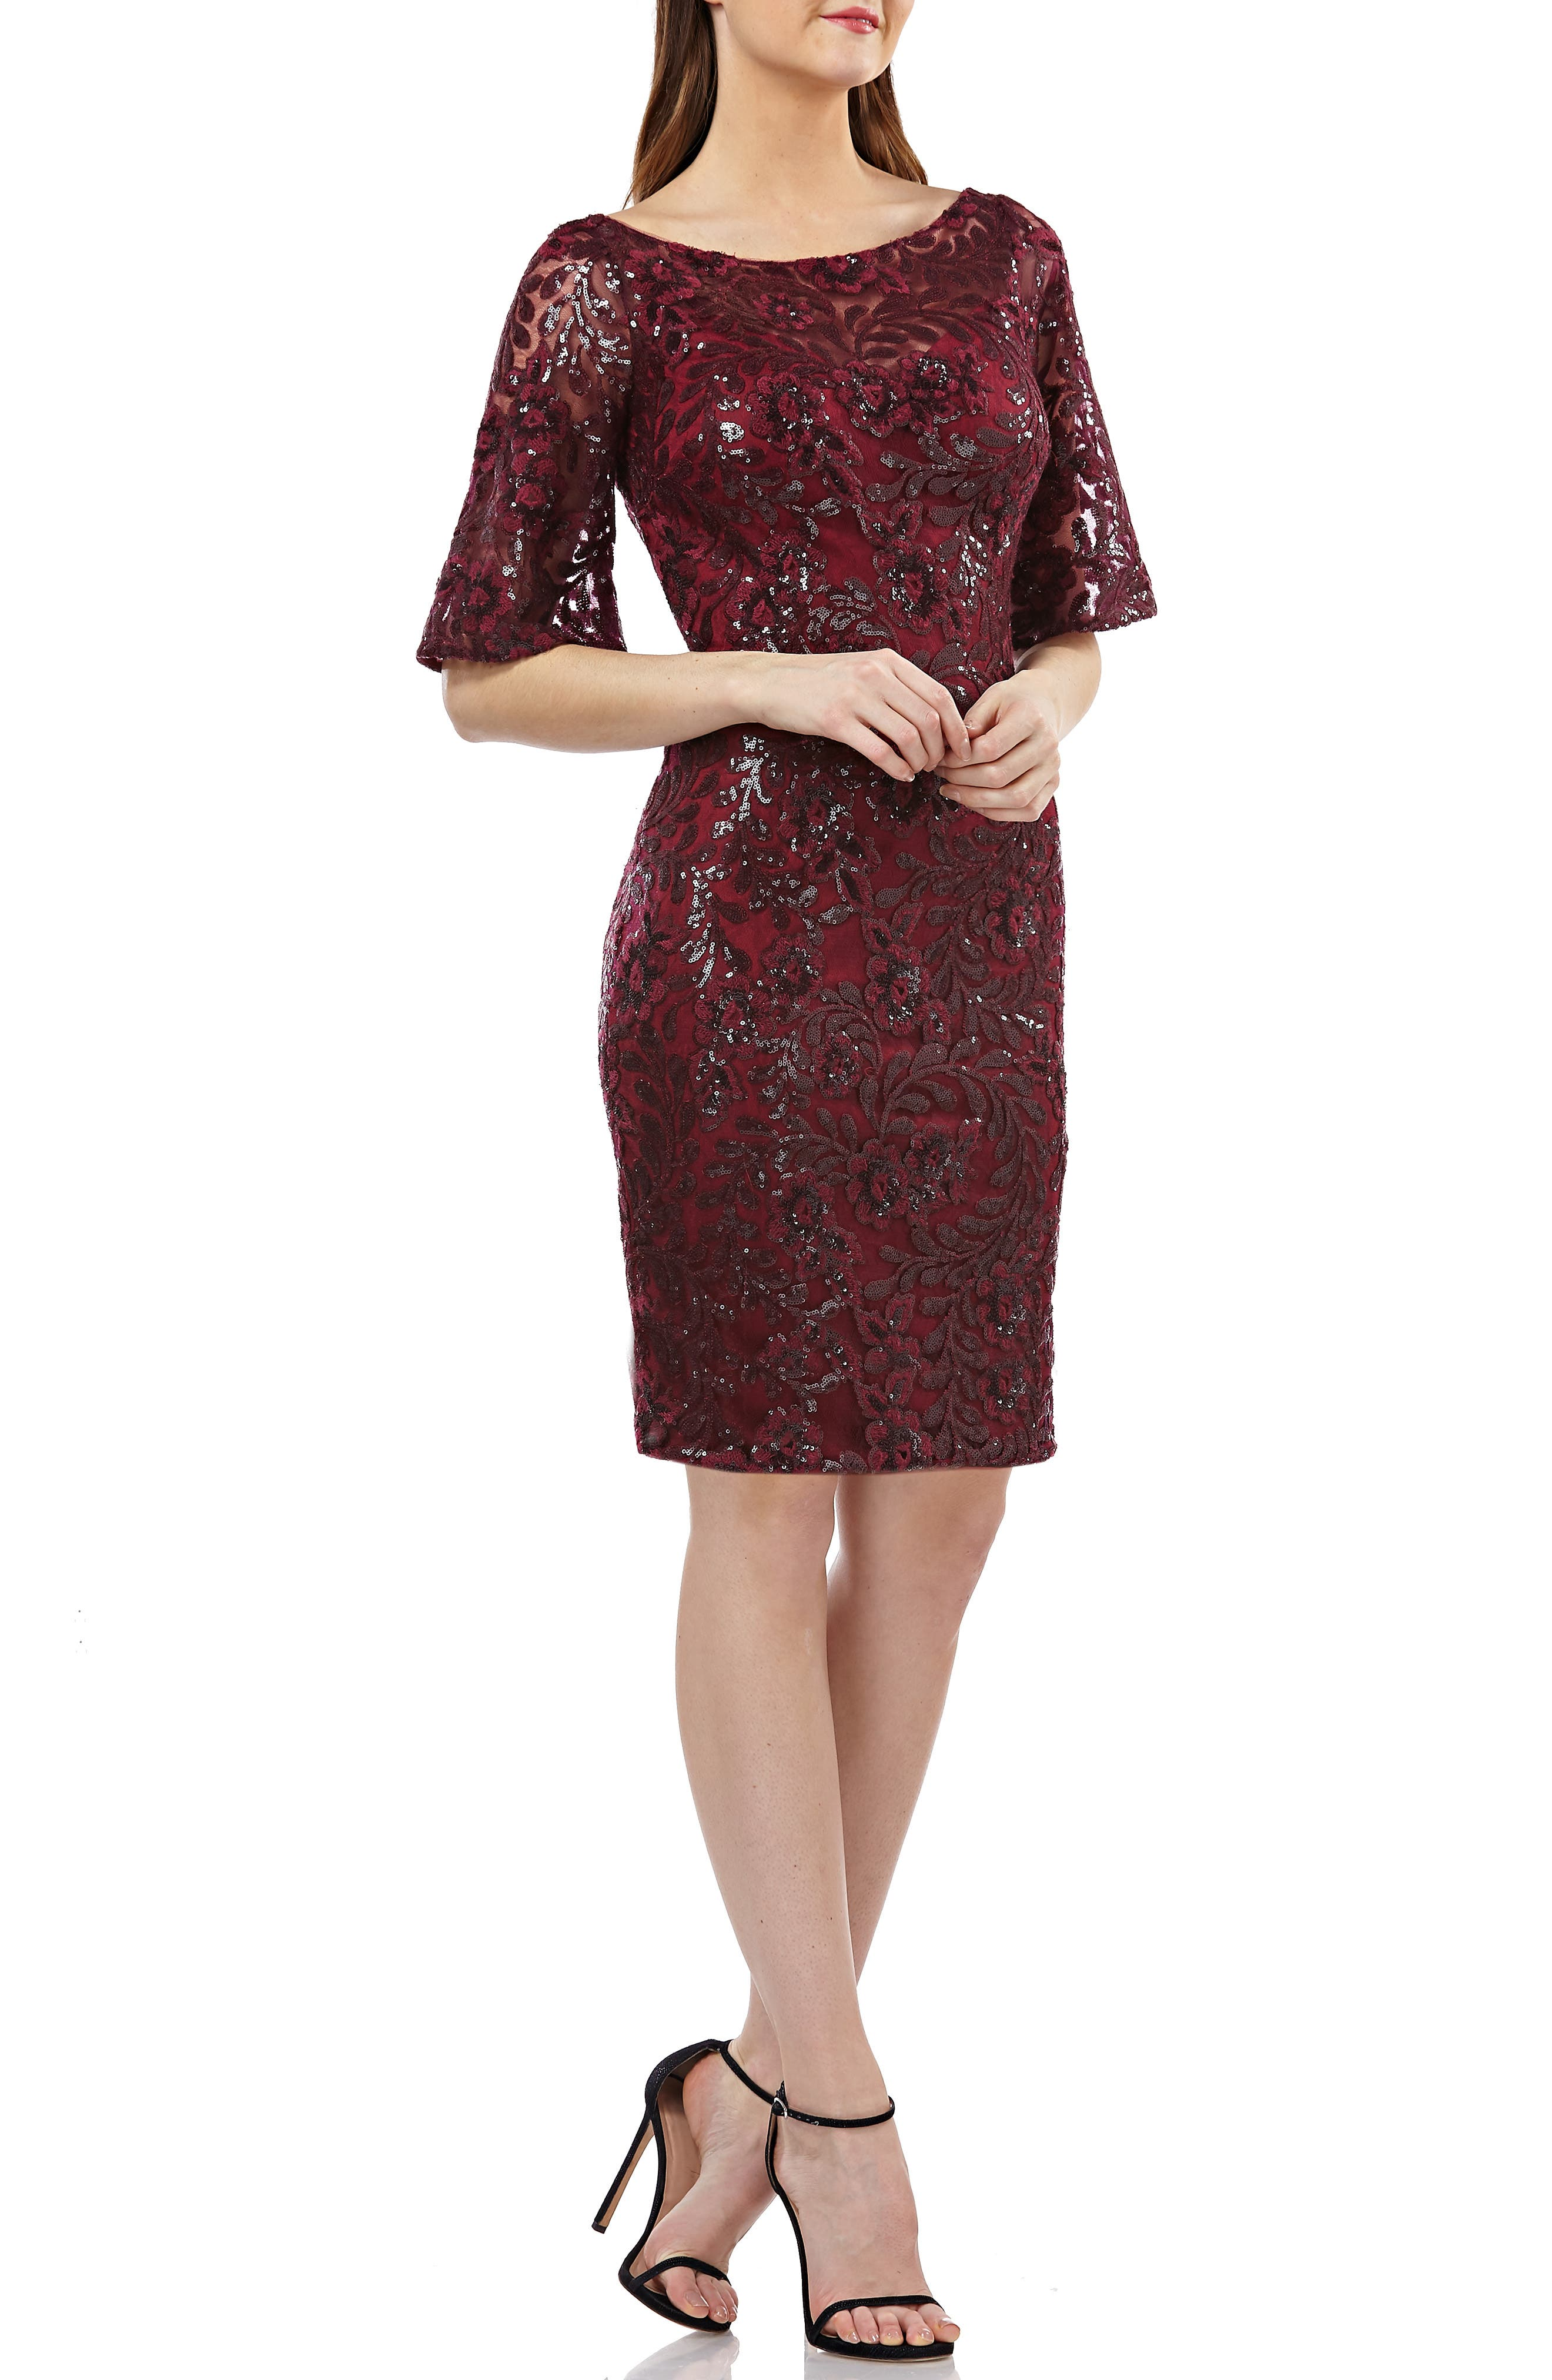 CARMEN MARC VALVO INFUSION V-Back Sequin Lace Cocktail Dress in Burgundy